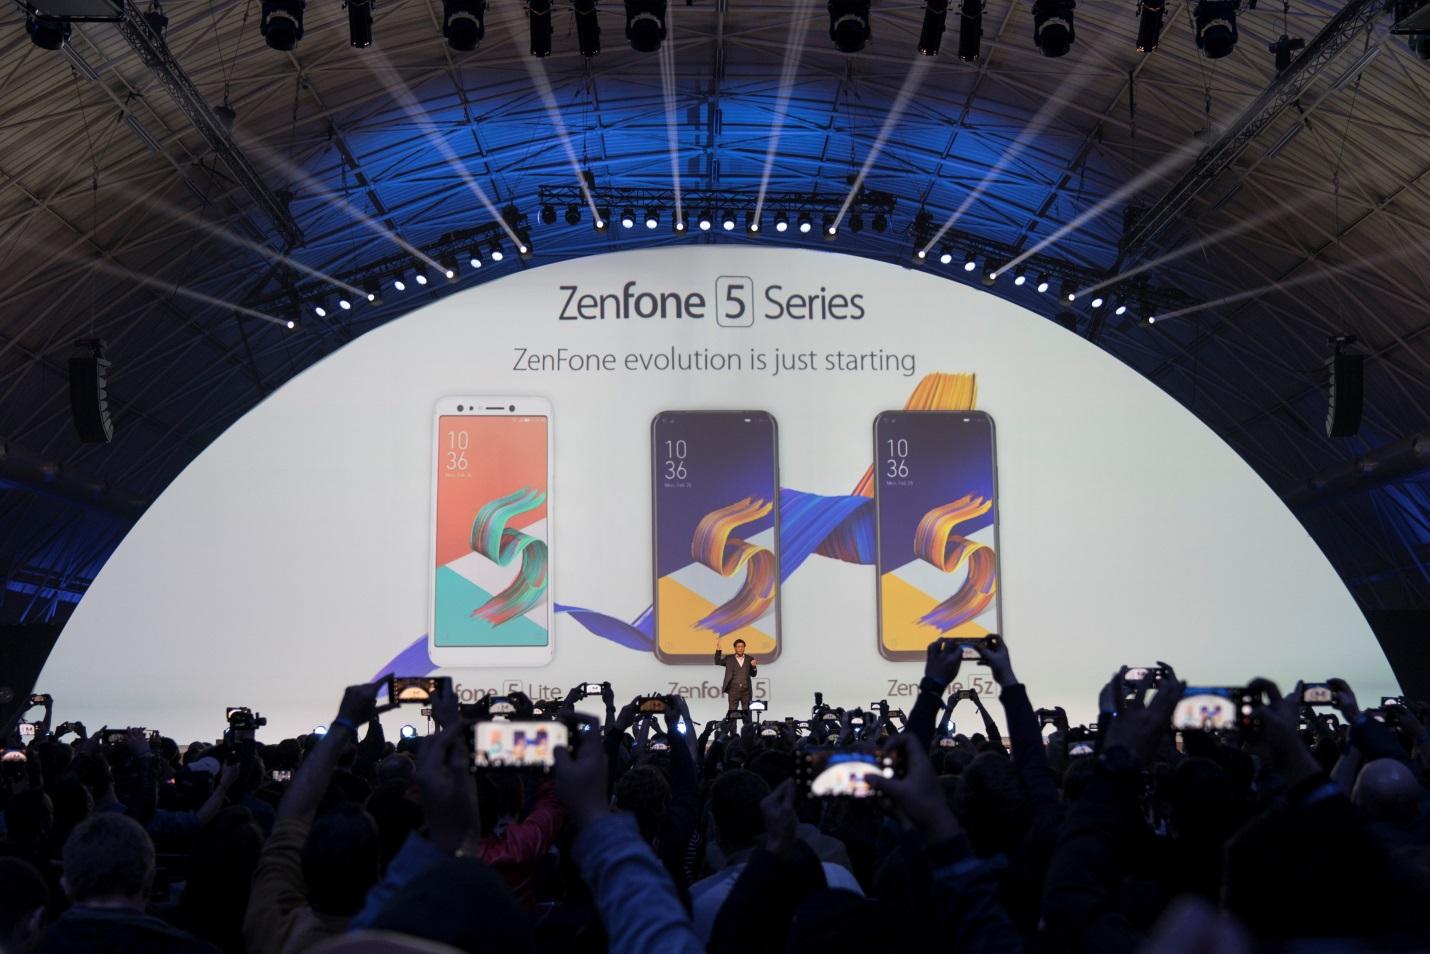 Zenfone 5 Unveil